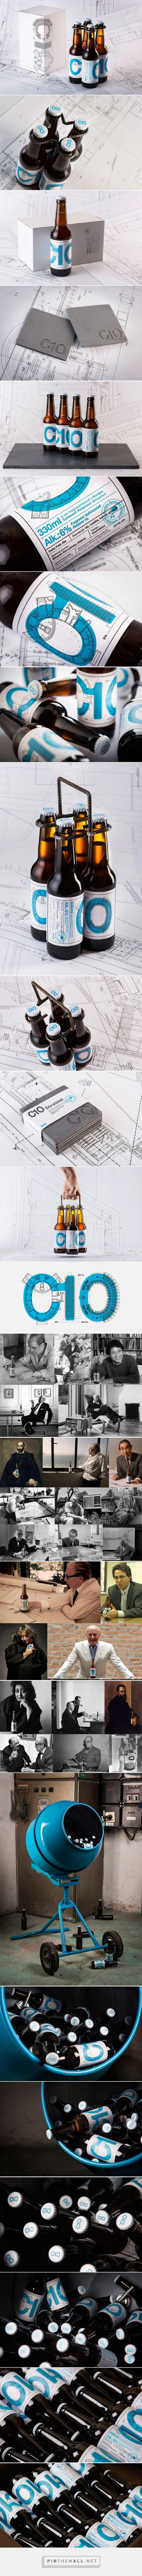 The 1st 'Architect' Beer designed by Kissmiklos - http://www.packagingoftheworld.com/2015/11/c10-1st-architect-beer.html